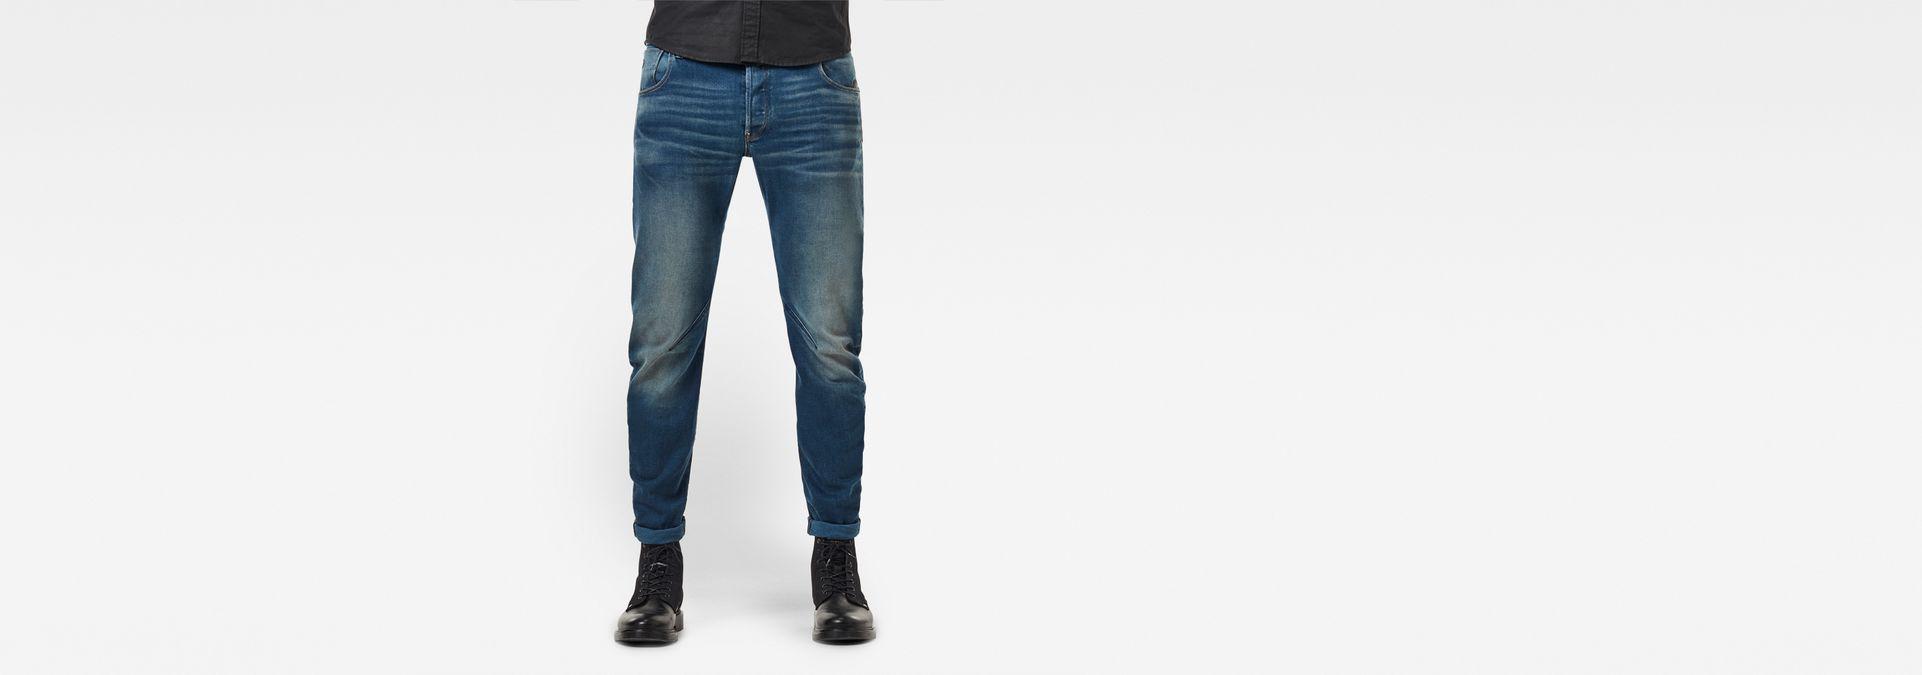 acce23b11e8 Arc 3D Slim Jeans | Medium Aged | Men | G-Star RAW®